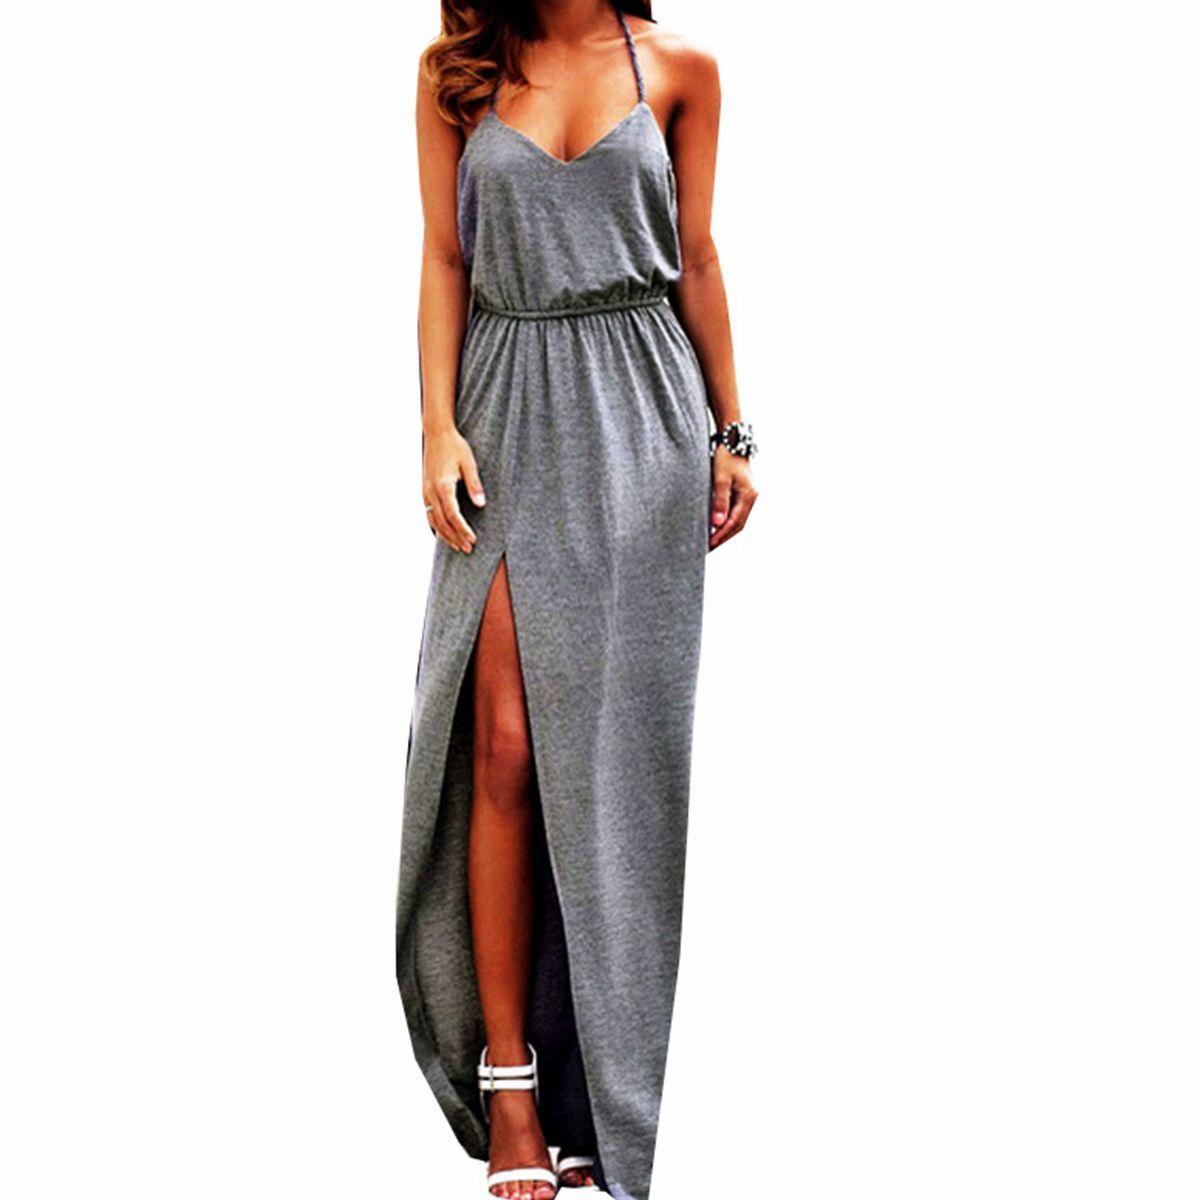 summer style women backless sleeveless vneck boho maxi long